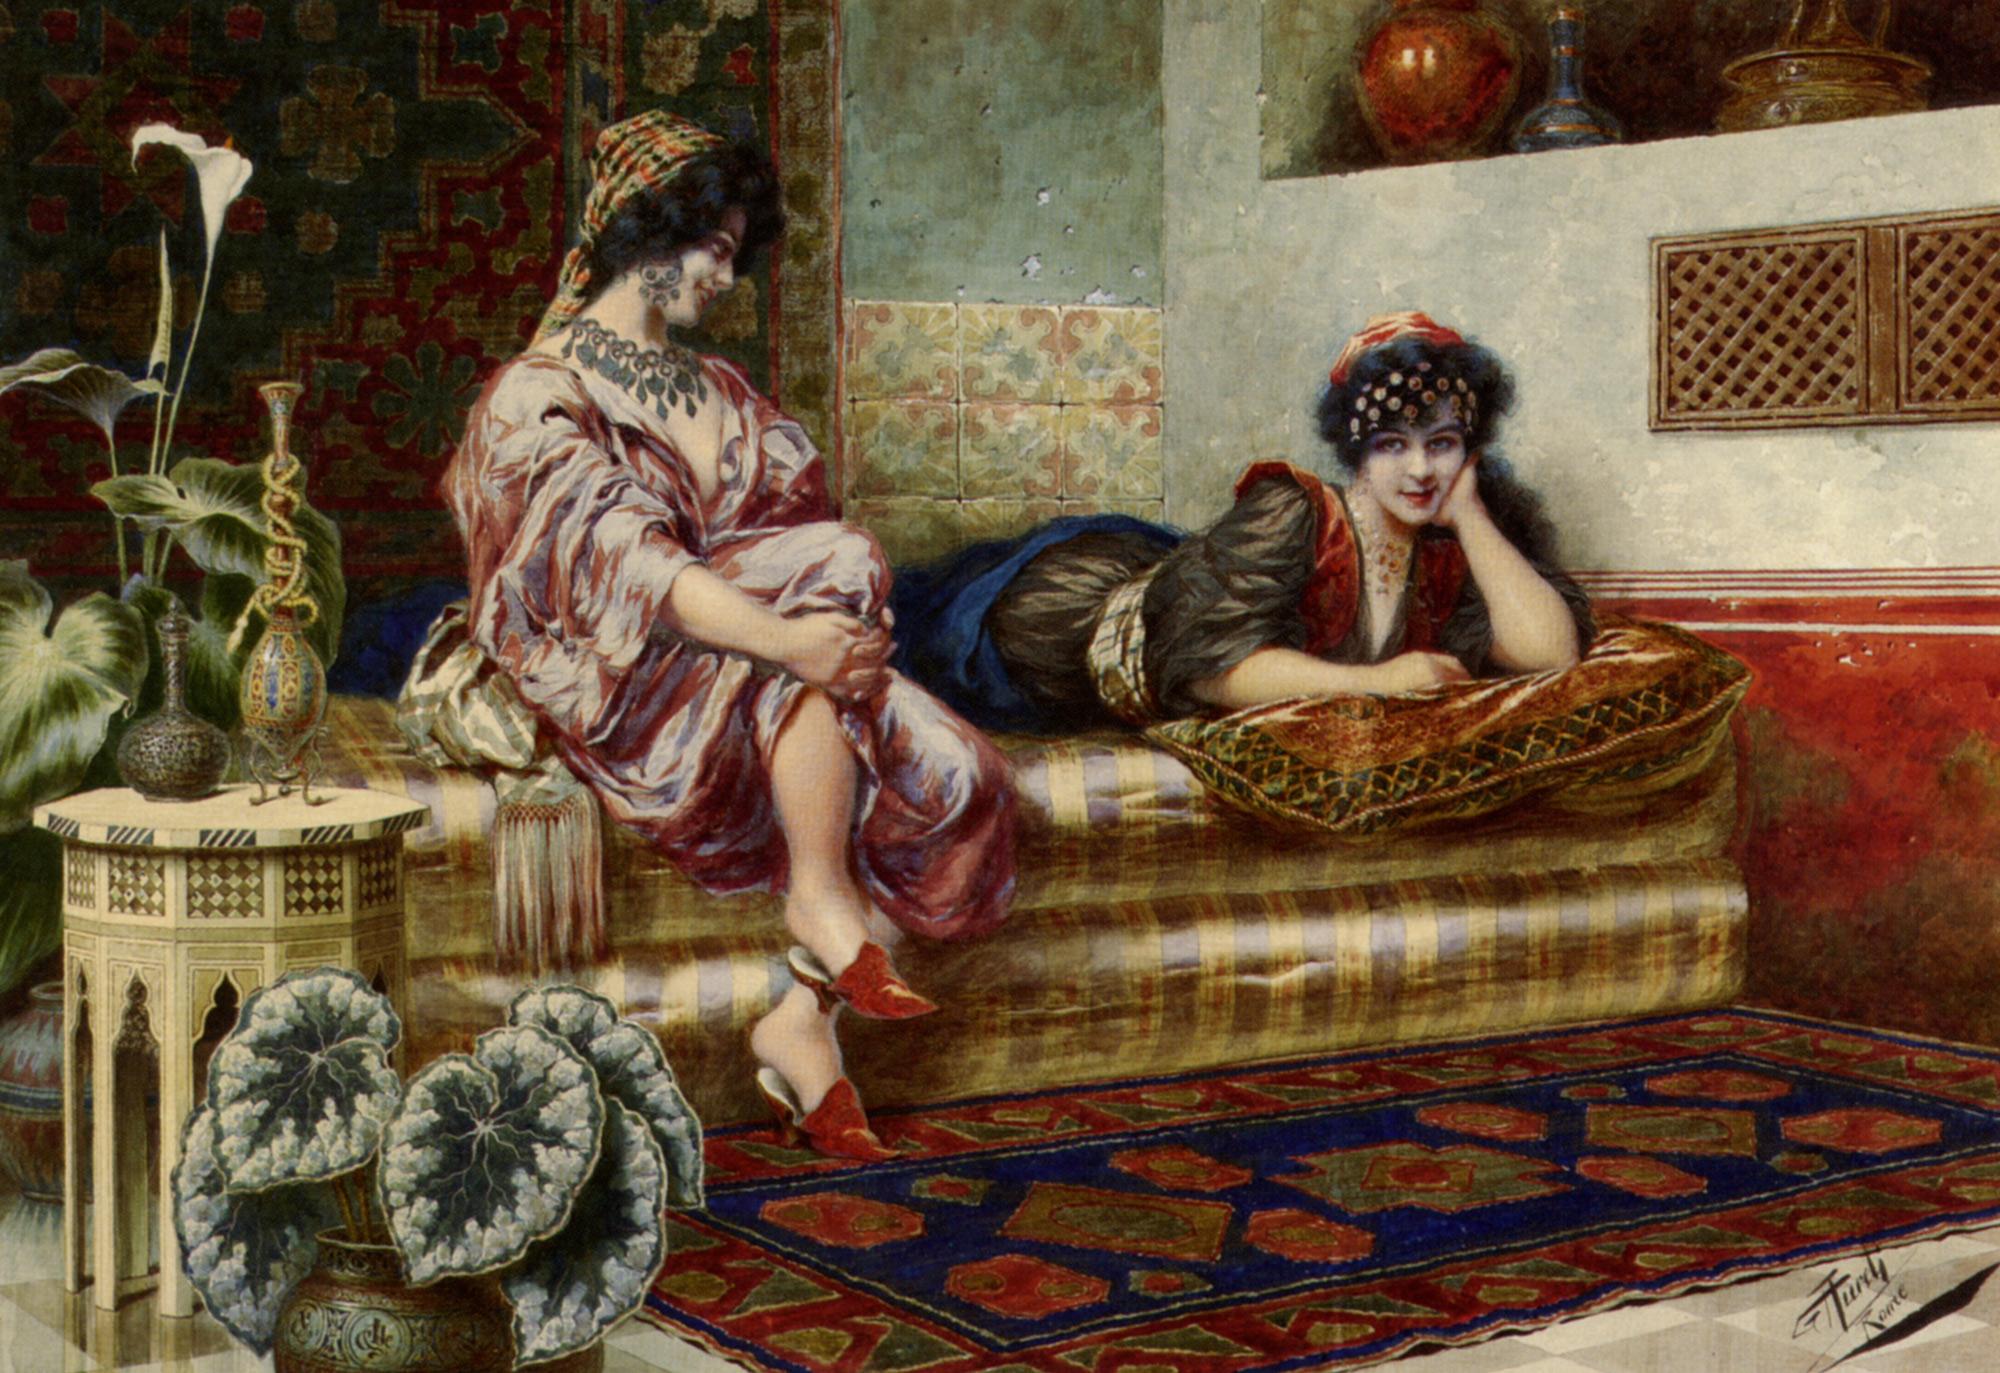 Idle Hours in the Harem :: Franz Von Defregger - Arab women (Harem Life scenes) in art  and painting ôîòî